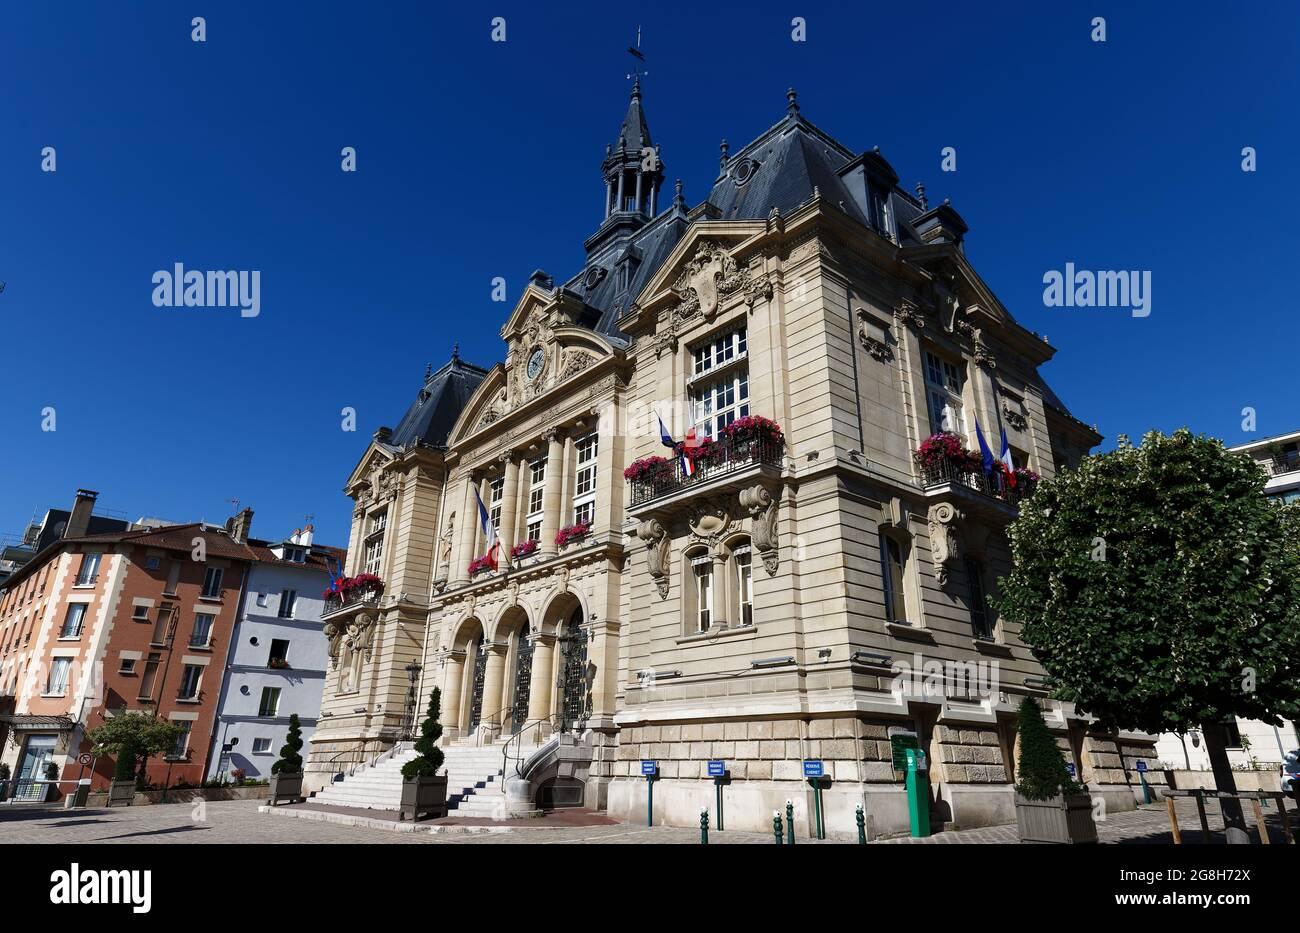 Suresnes town hall . It is municipality of the department Hauts-de-Seine in the region Ile-de-France. Stock Photo